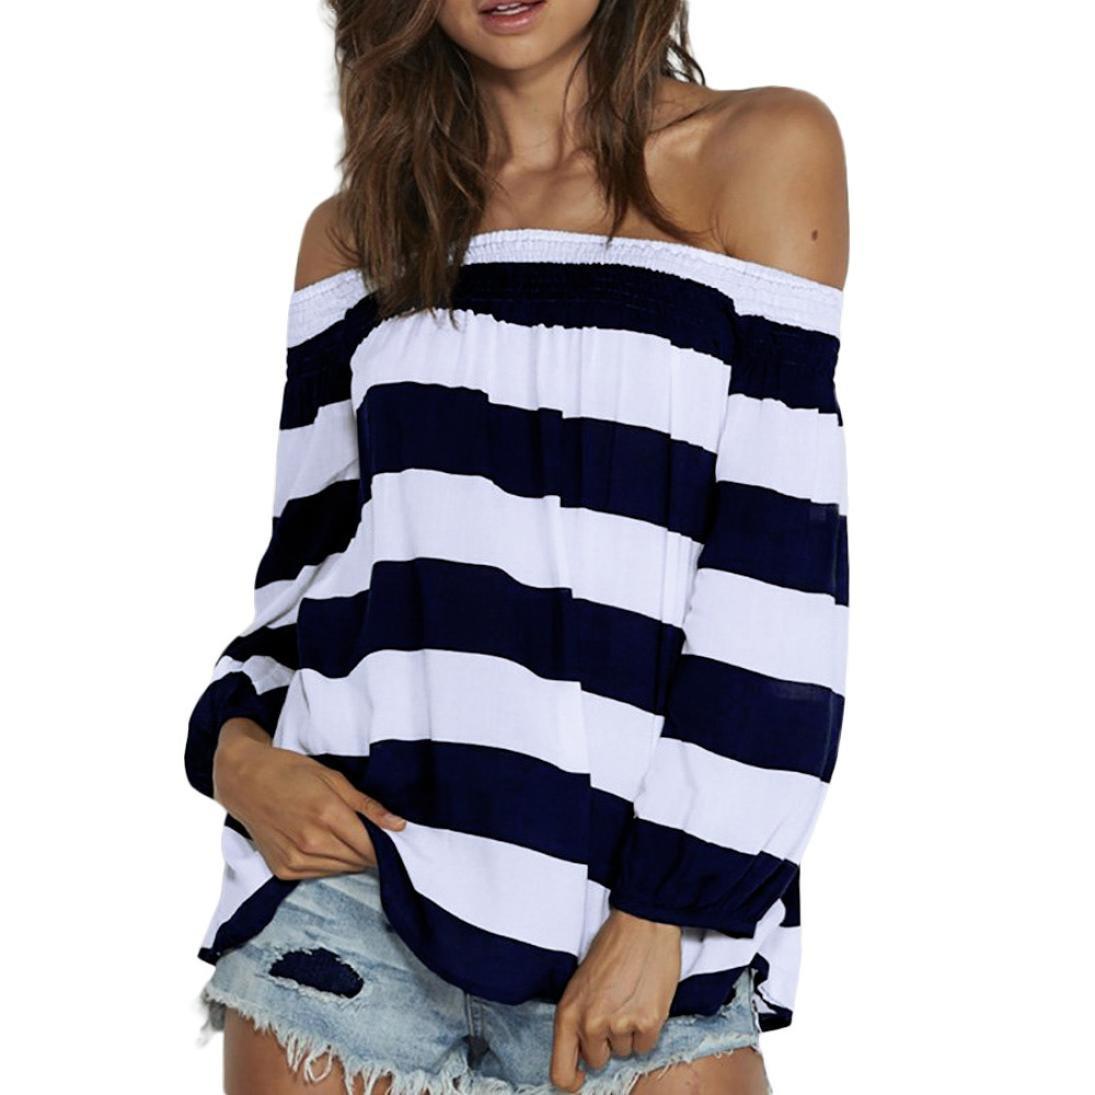 Women's Clothing Humble Satin Women Thin Wild Solid Camis Vest Women Tank Tops Female 2019 Summer Sexy Strap Basic Tops Chiffon Sleeveless Vest